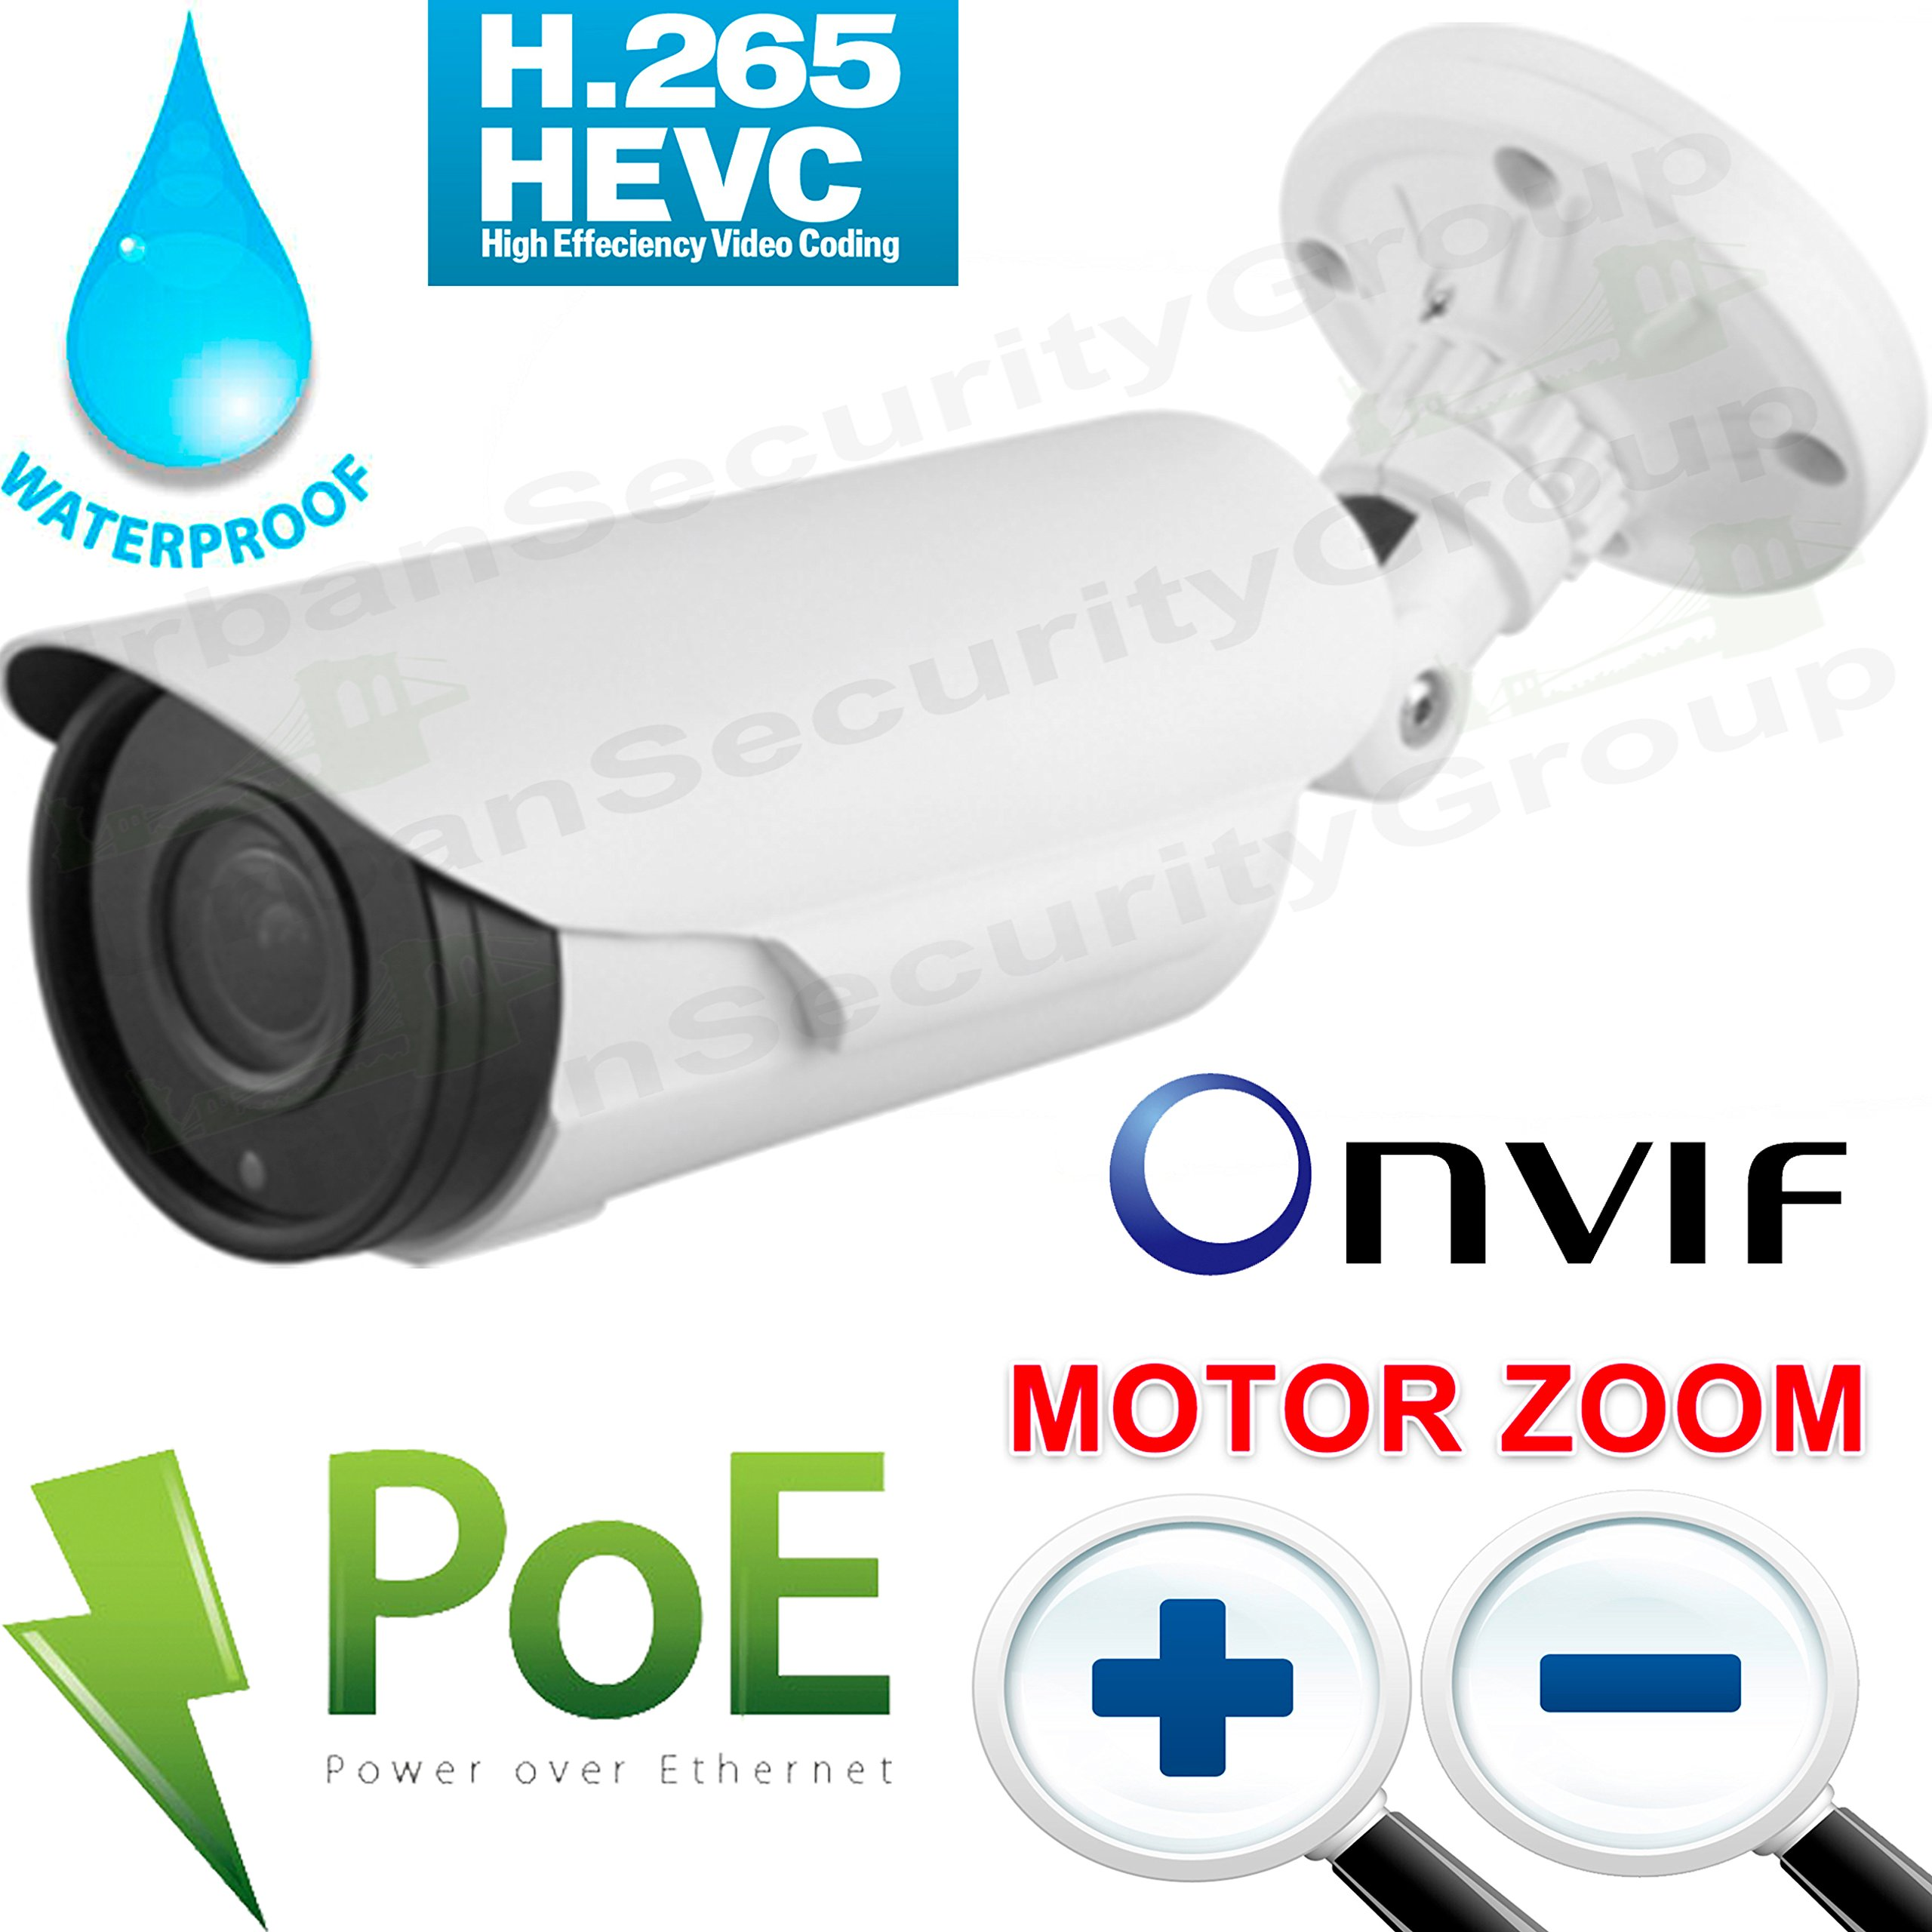 USG 4MP MOTORIZED 2.7-13.5mm Auto-Focus Lens H.265 Ultra HD IP PoE Network Bullet Security Camera : ONVIF 2.4, Weatherproof, 4x 42μ IR LED 130ft Nightvision, WDR: Business Grade : Phone App